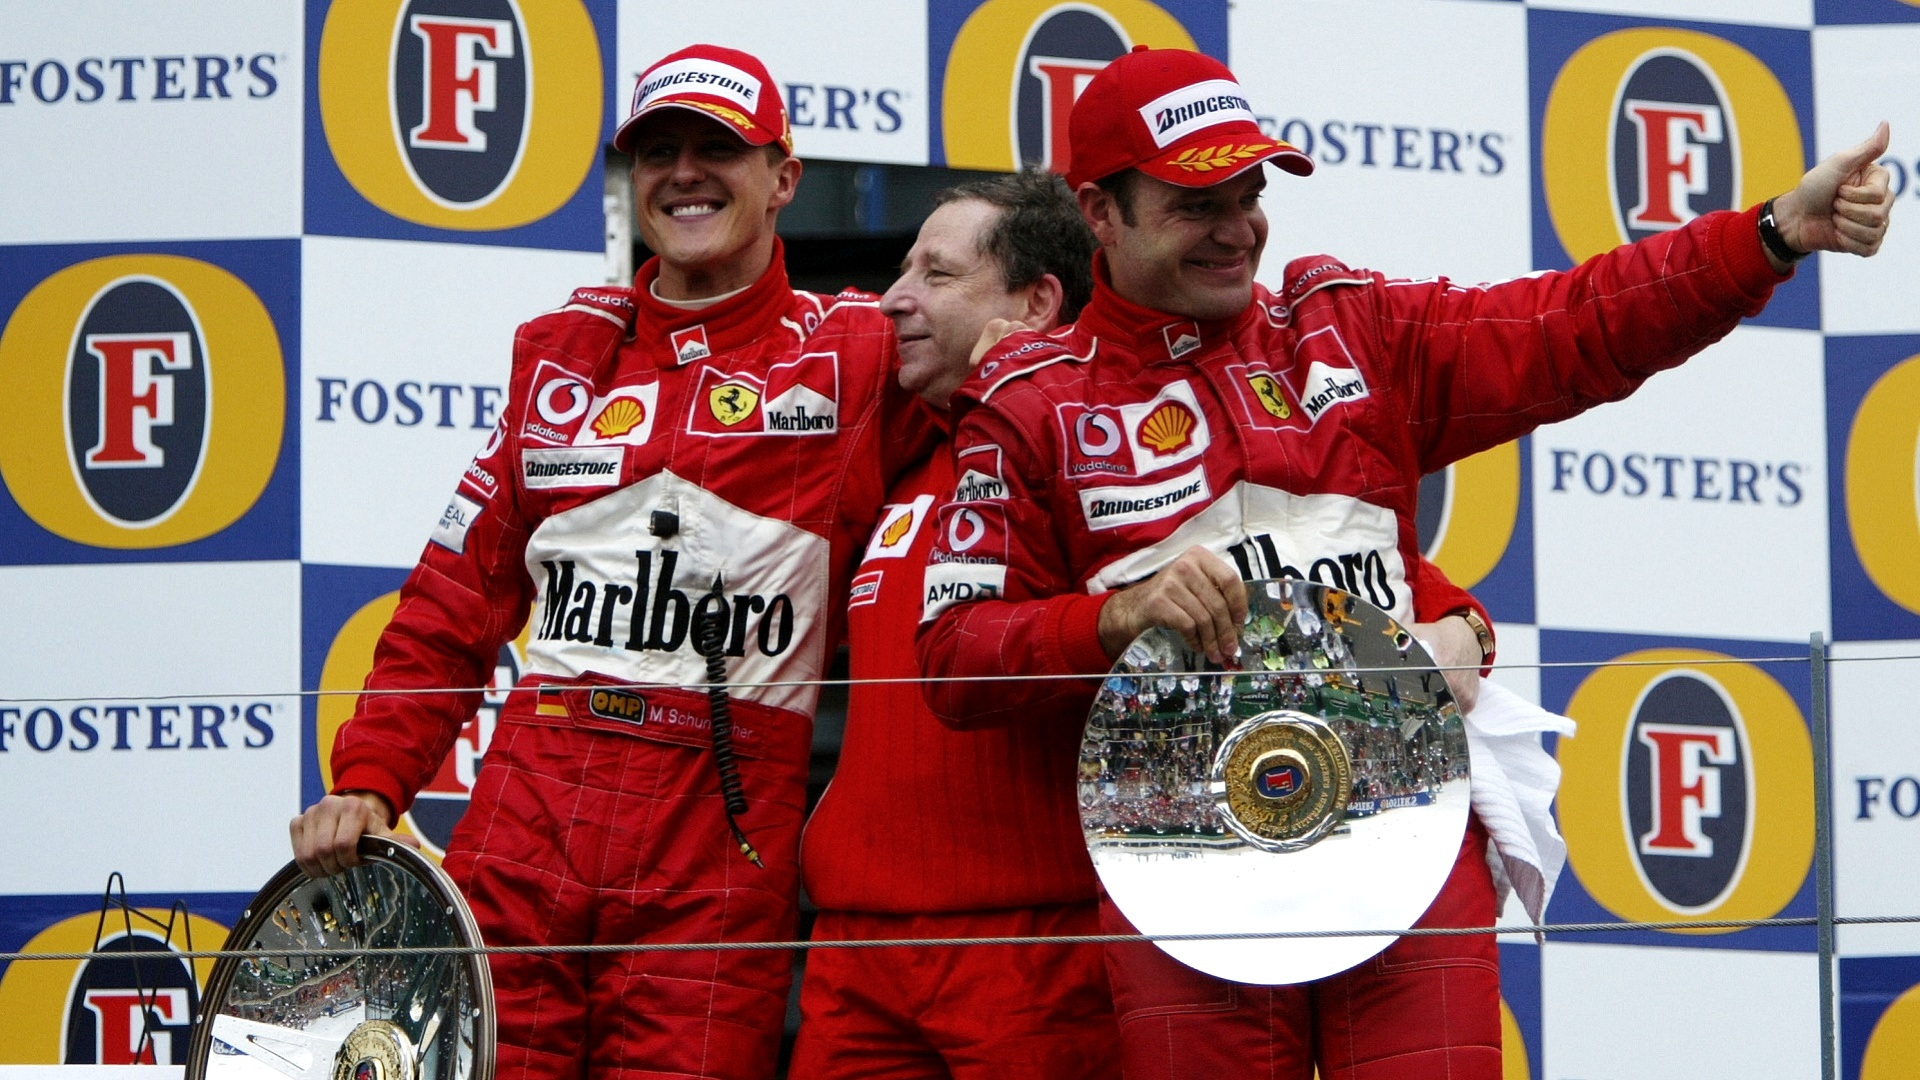 2021-03-22 2004 Michael Schumacher Todt Ferrari Formula 1 F1